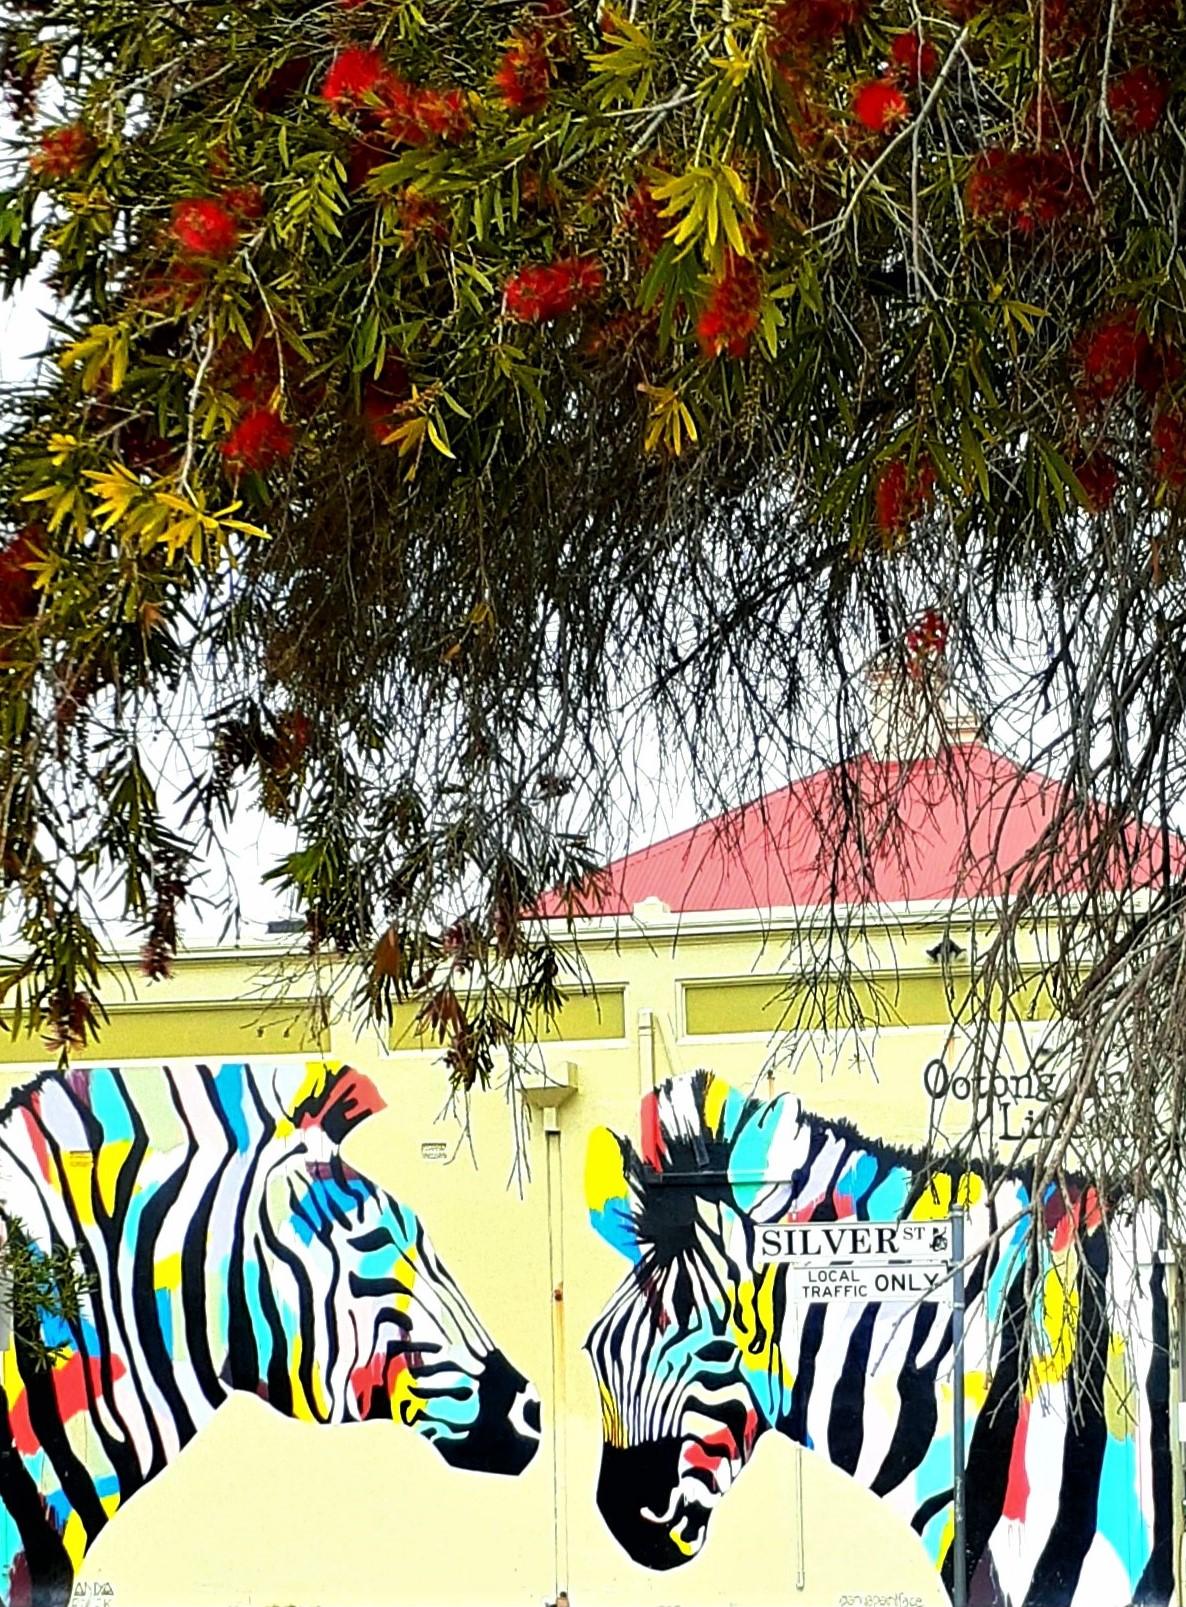 Zebras-B Brush